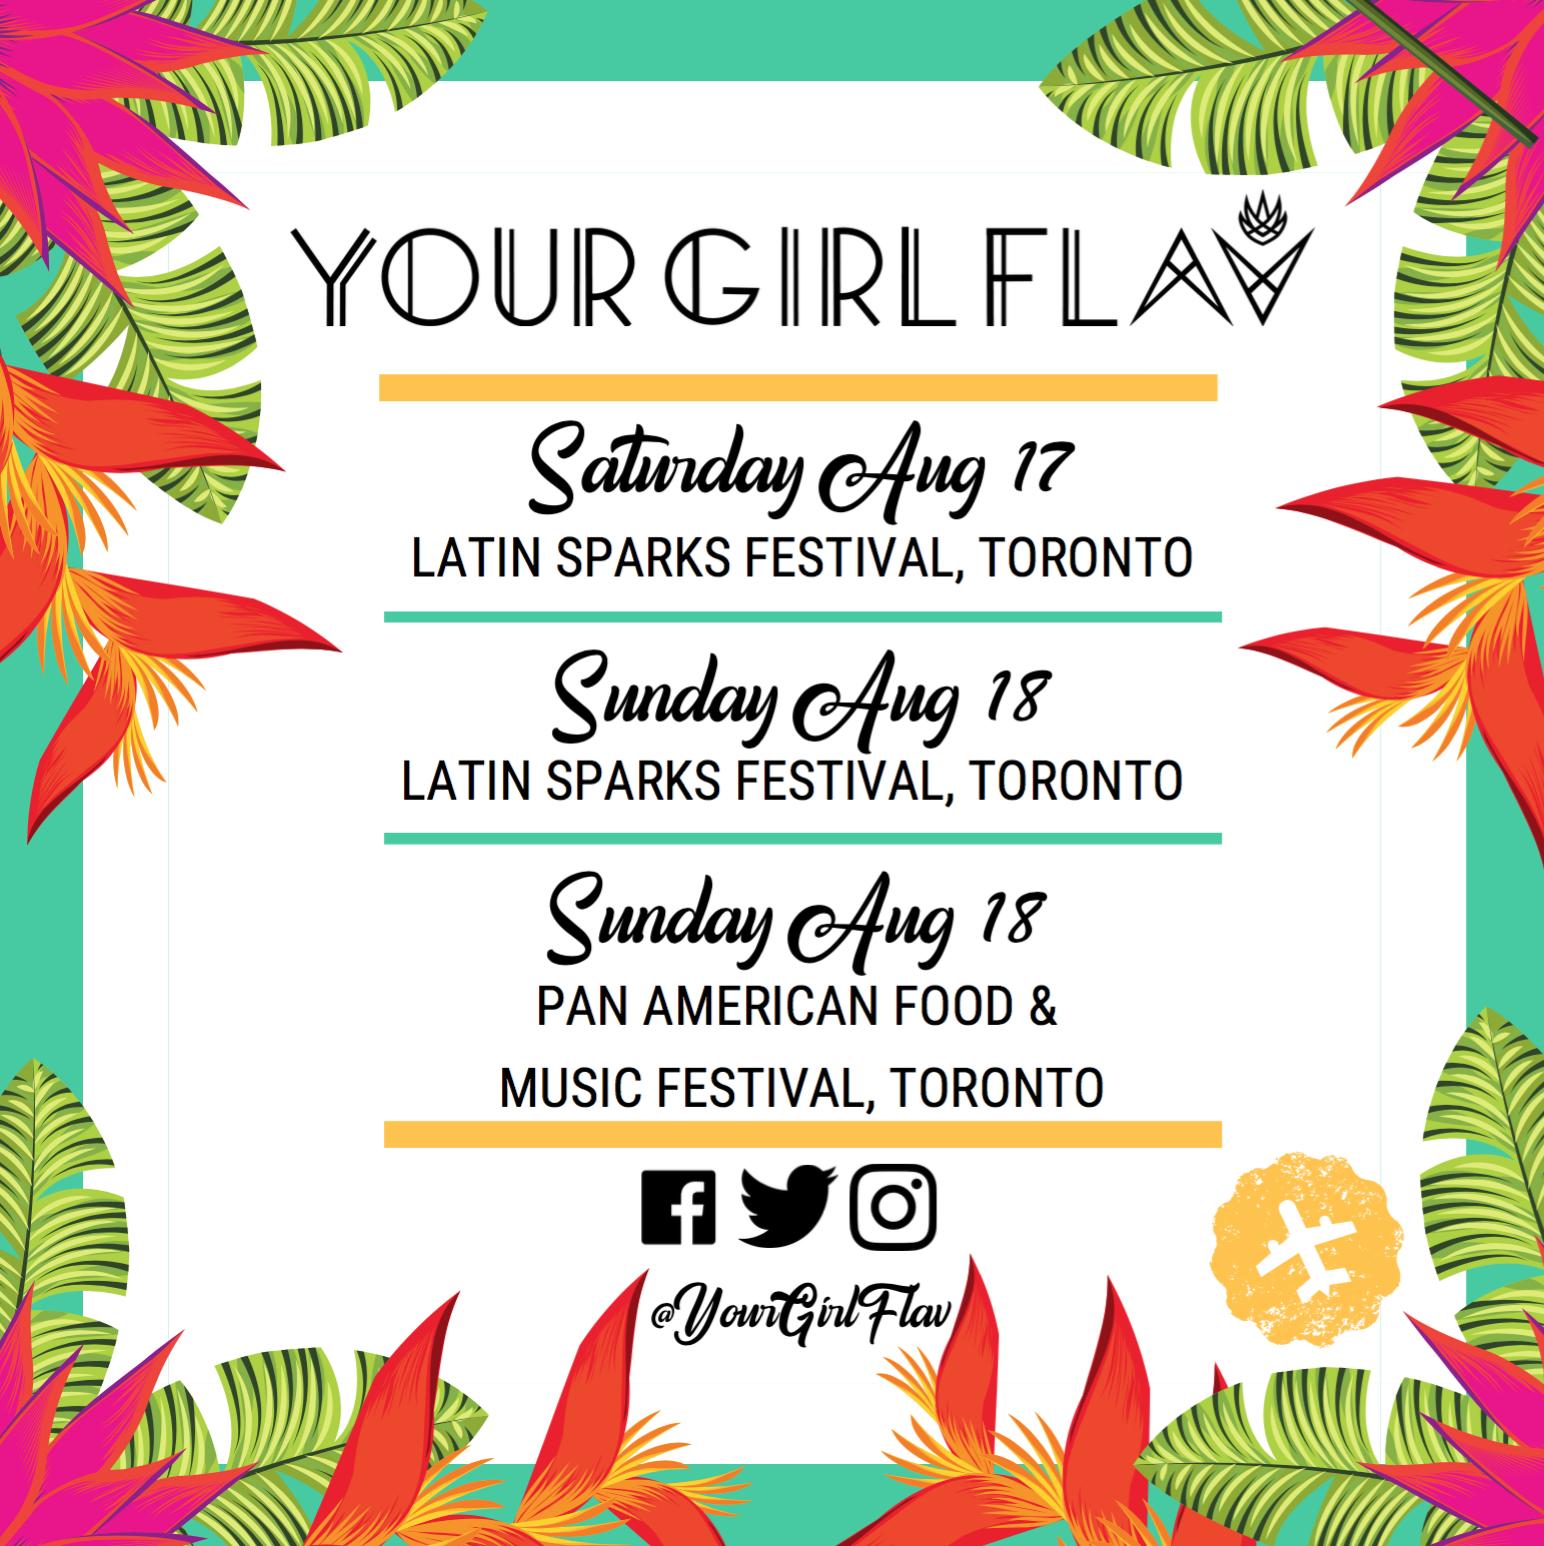 Flavia Abadia (Your Girl Flav) is a Female Toronto Based